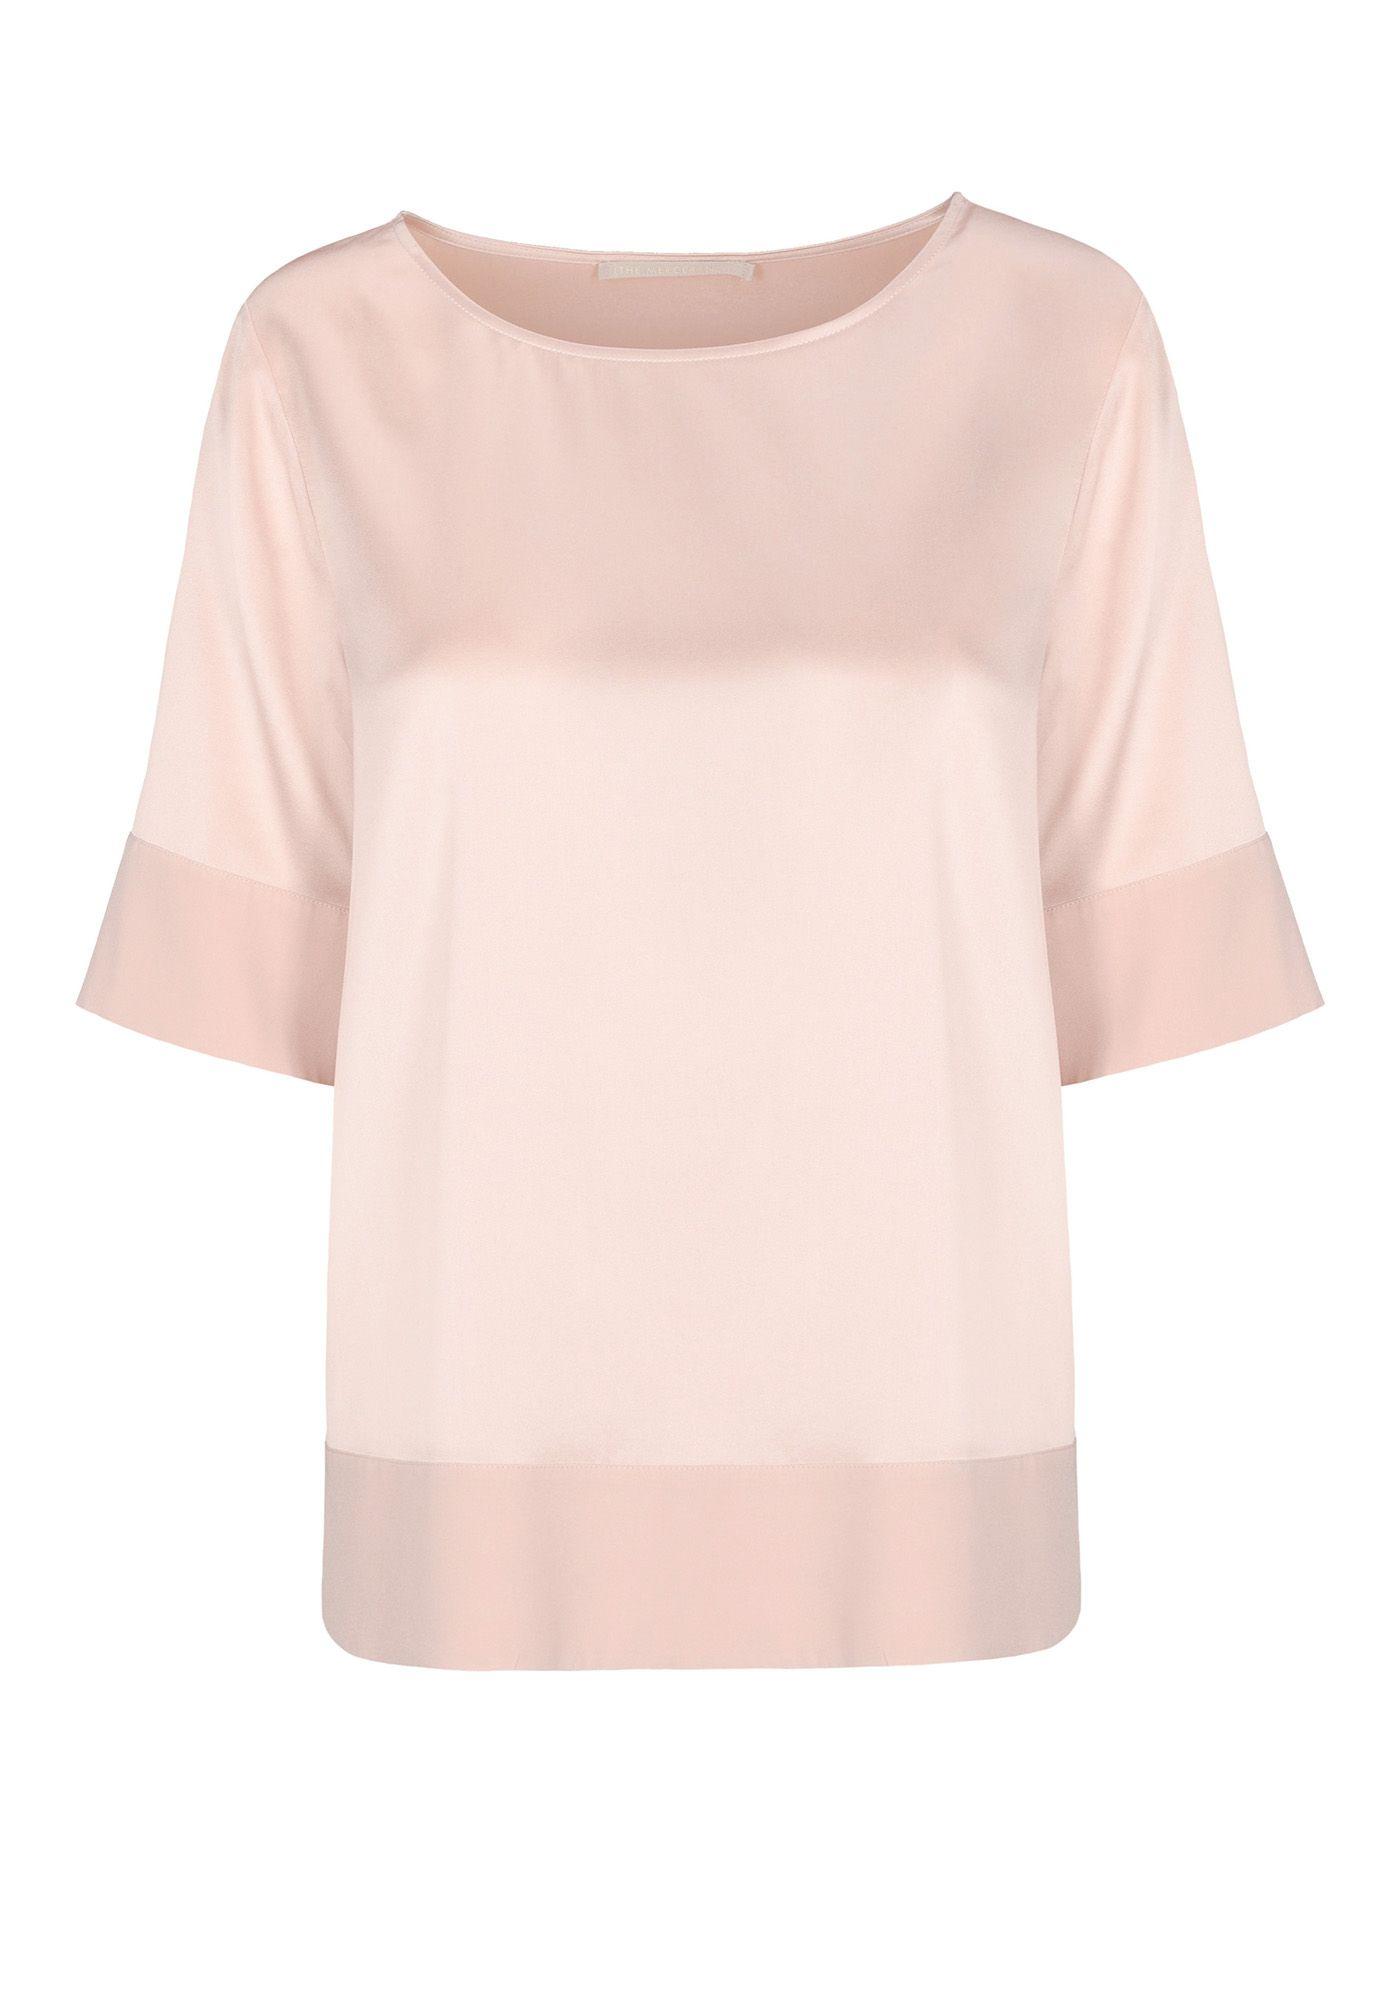 Seiden-Shirt mit breitem Saum - Nude